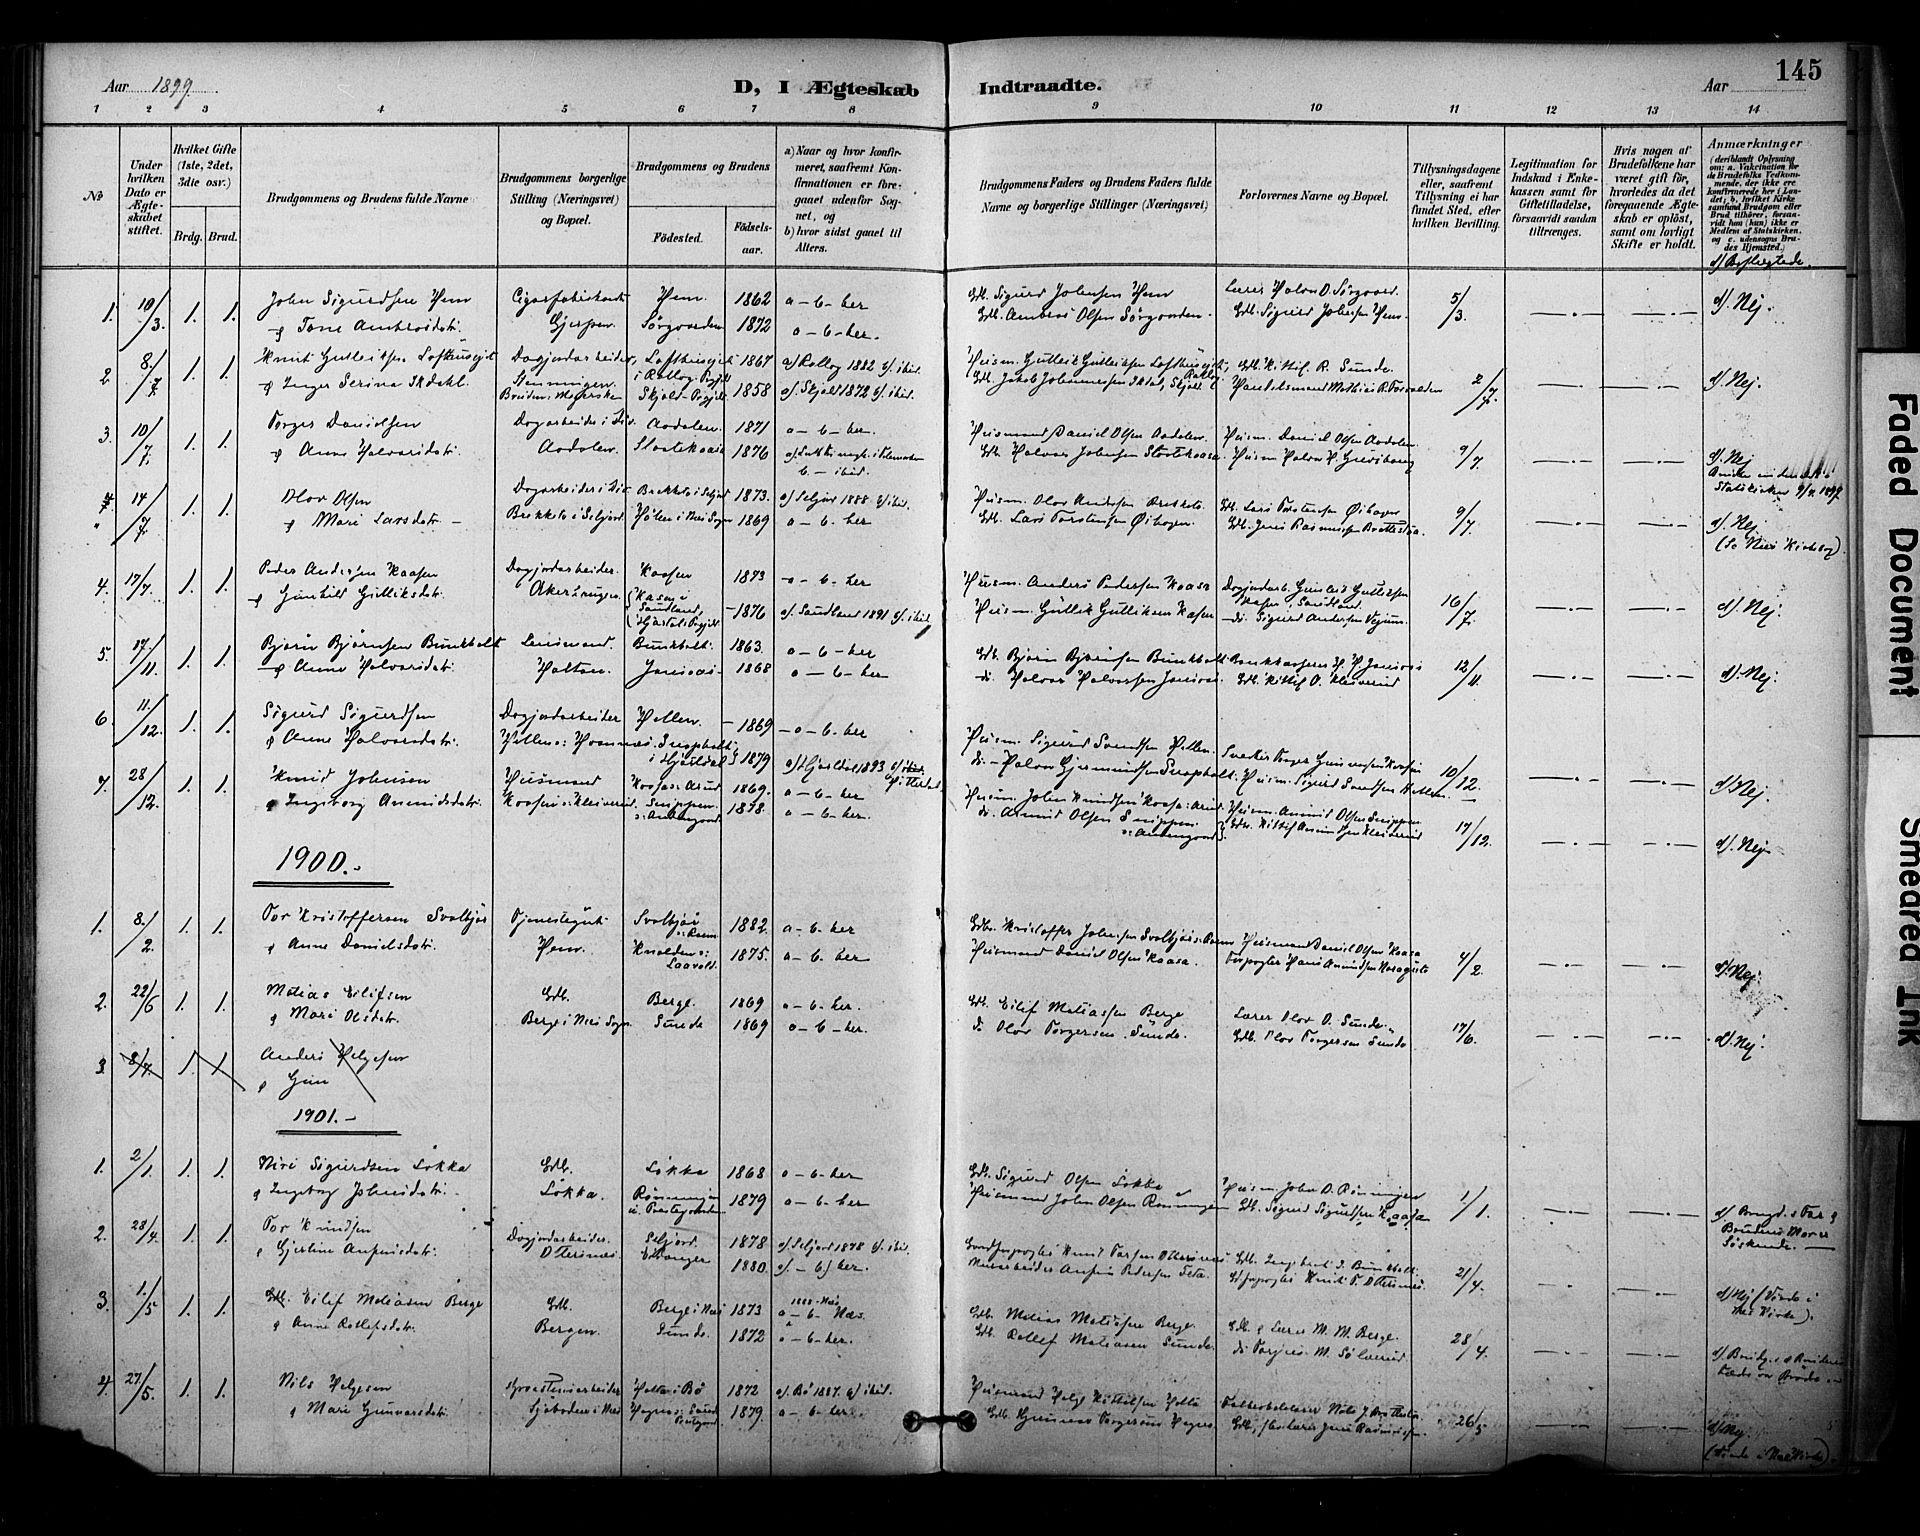 SAKO, Sauherad kirkebøker, F/Fa/L0009: Ministerialbok nr. I 9, 1887-1912, s. 145